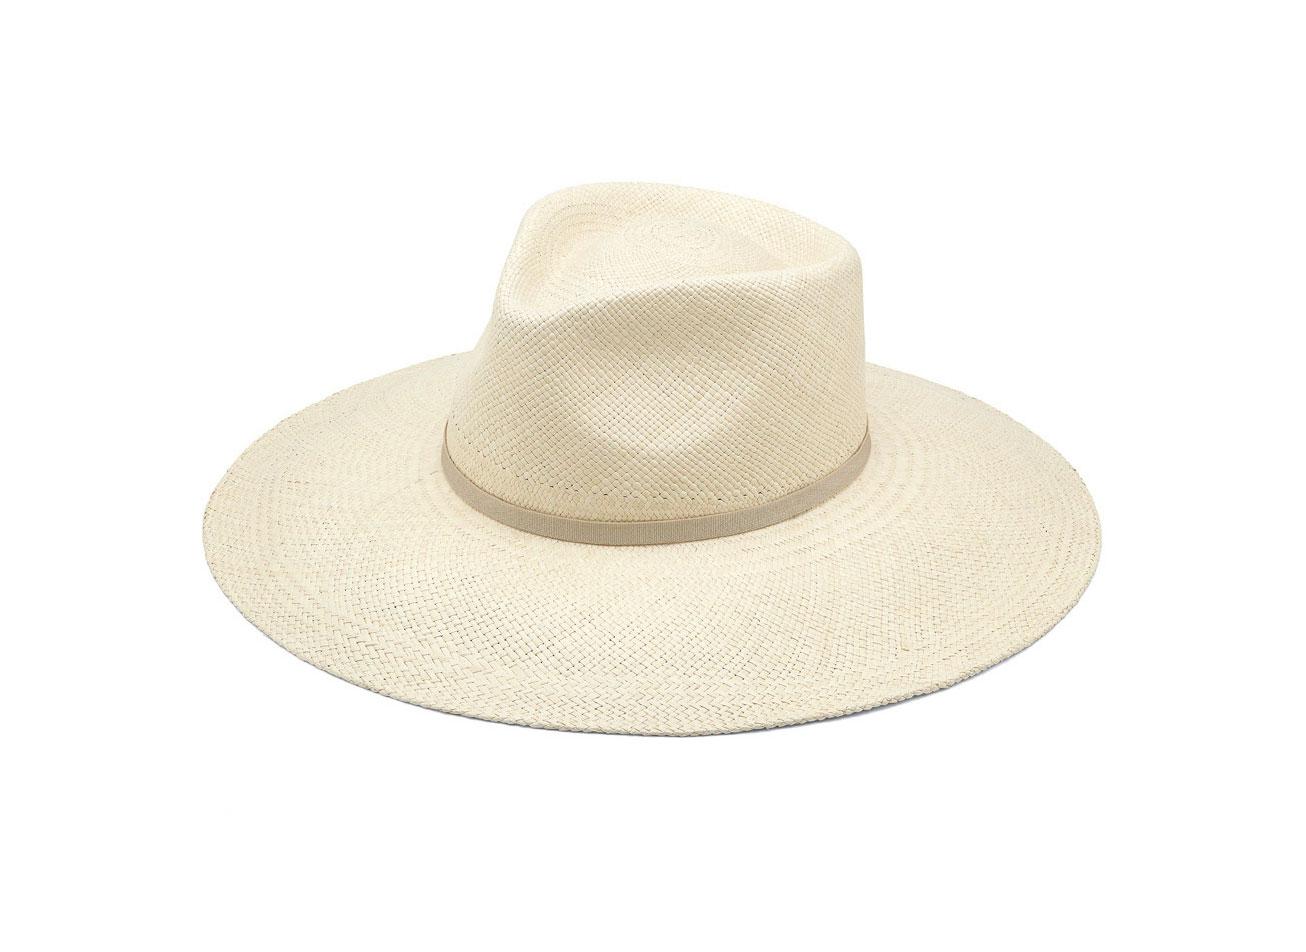 Cuyana summer hat